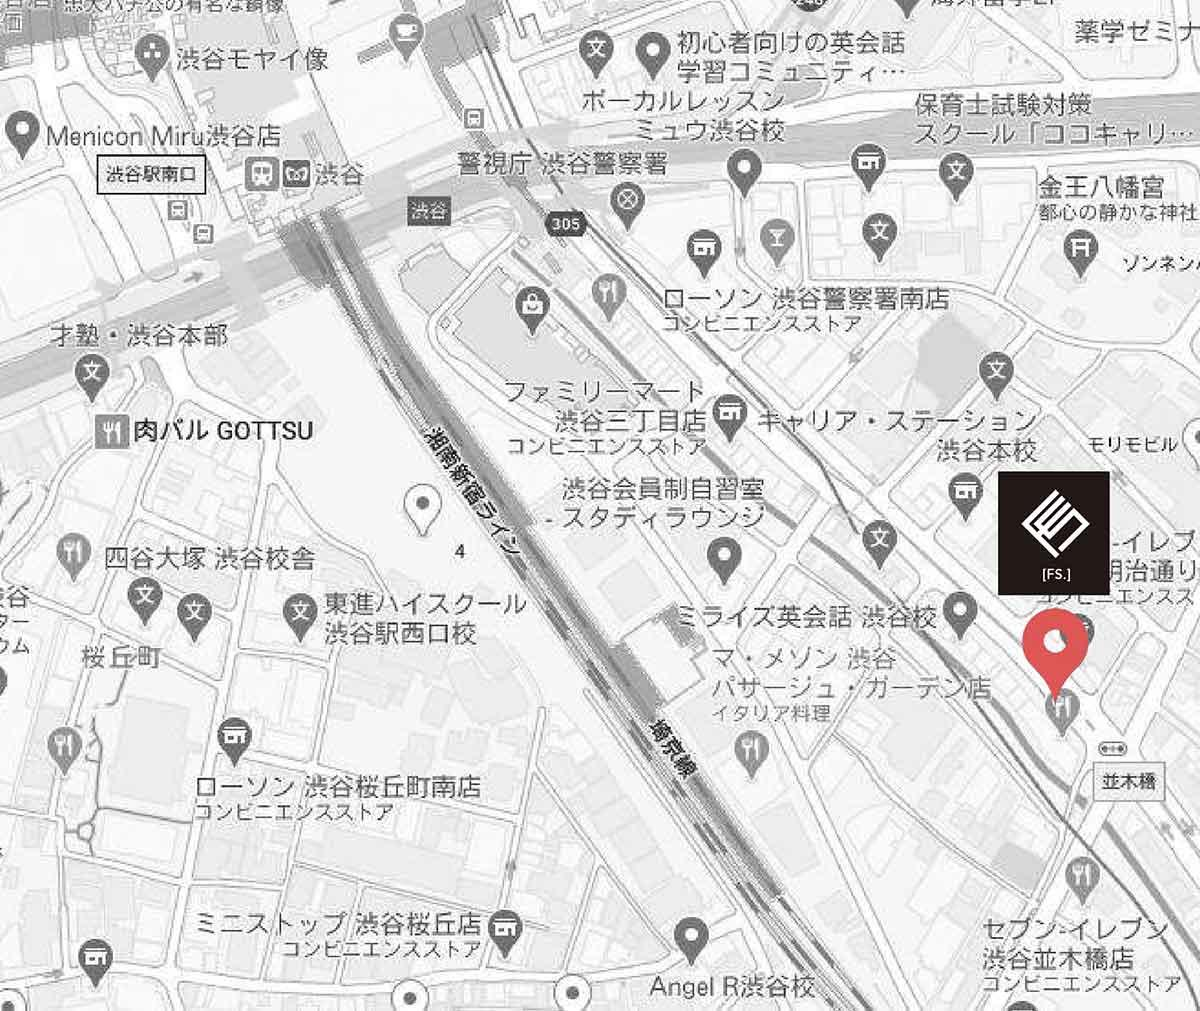 05_FS地図資料.jpg